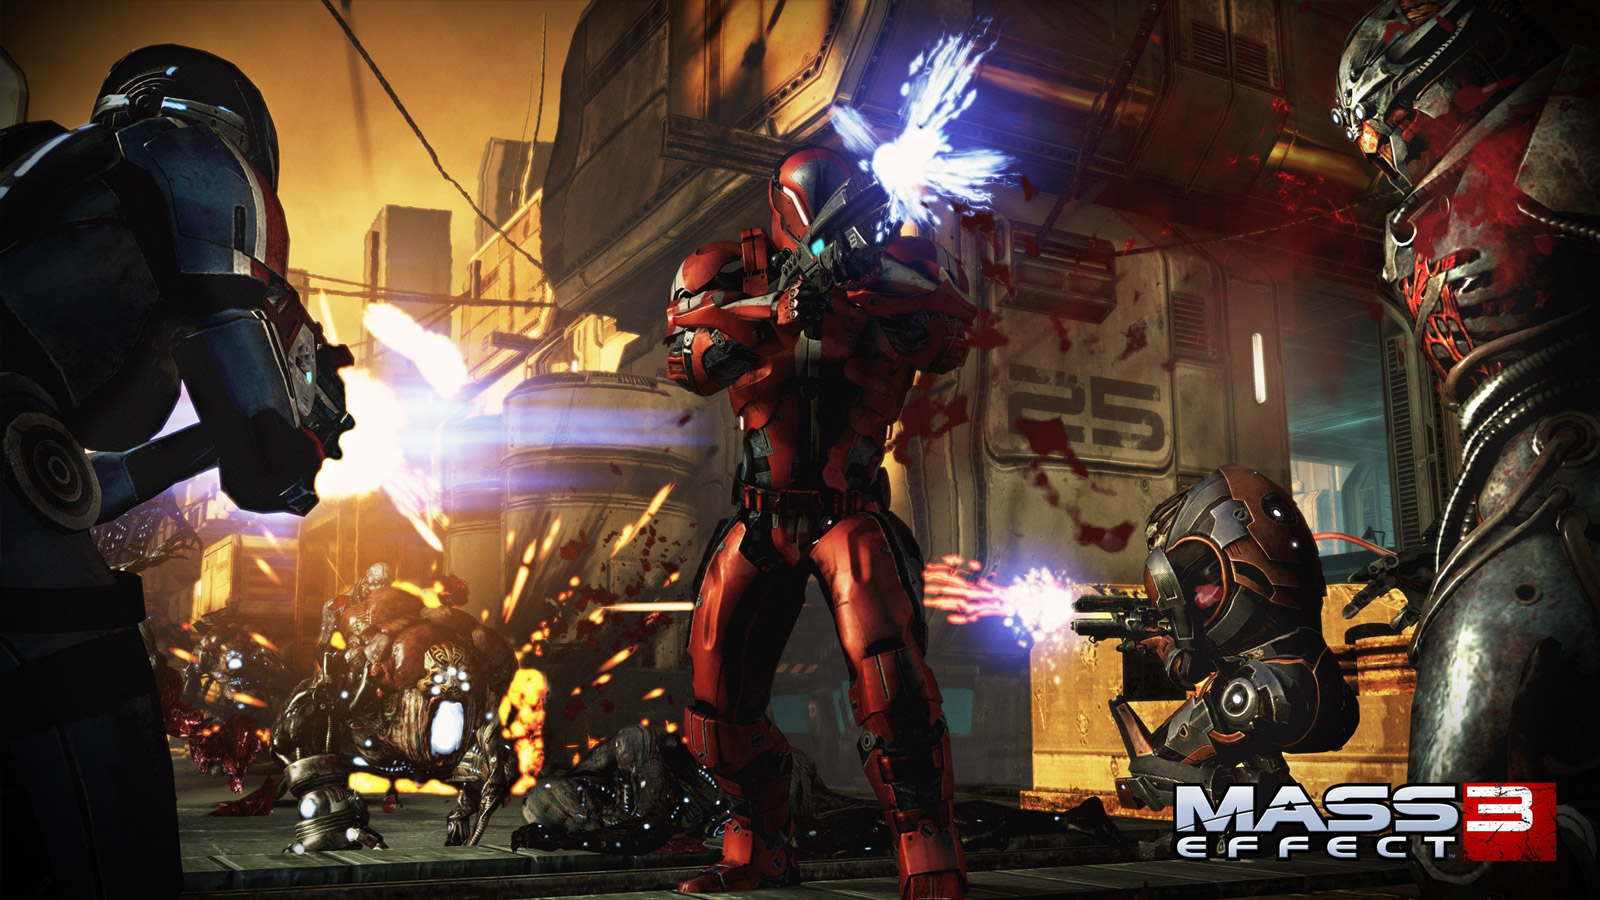 Free Mass Effect 3 Wallpaper in 1600x900